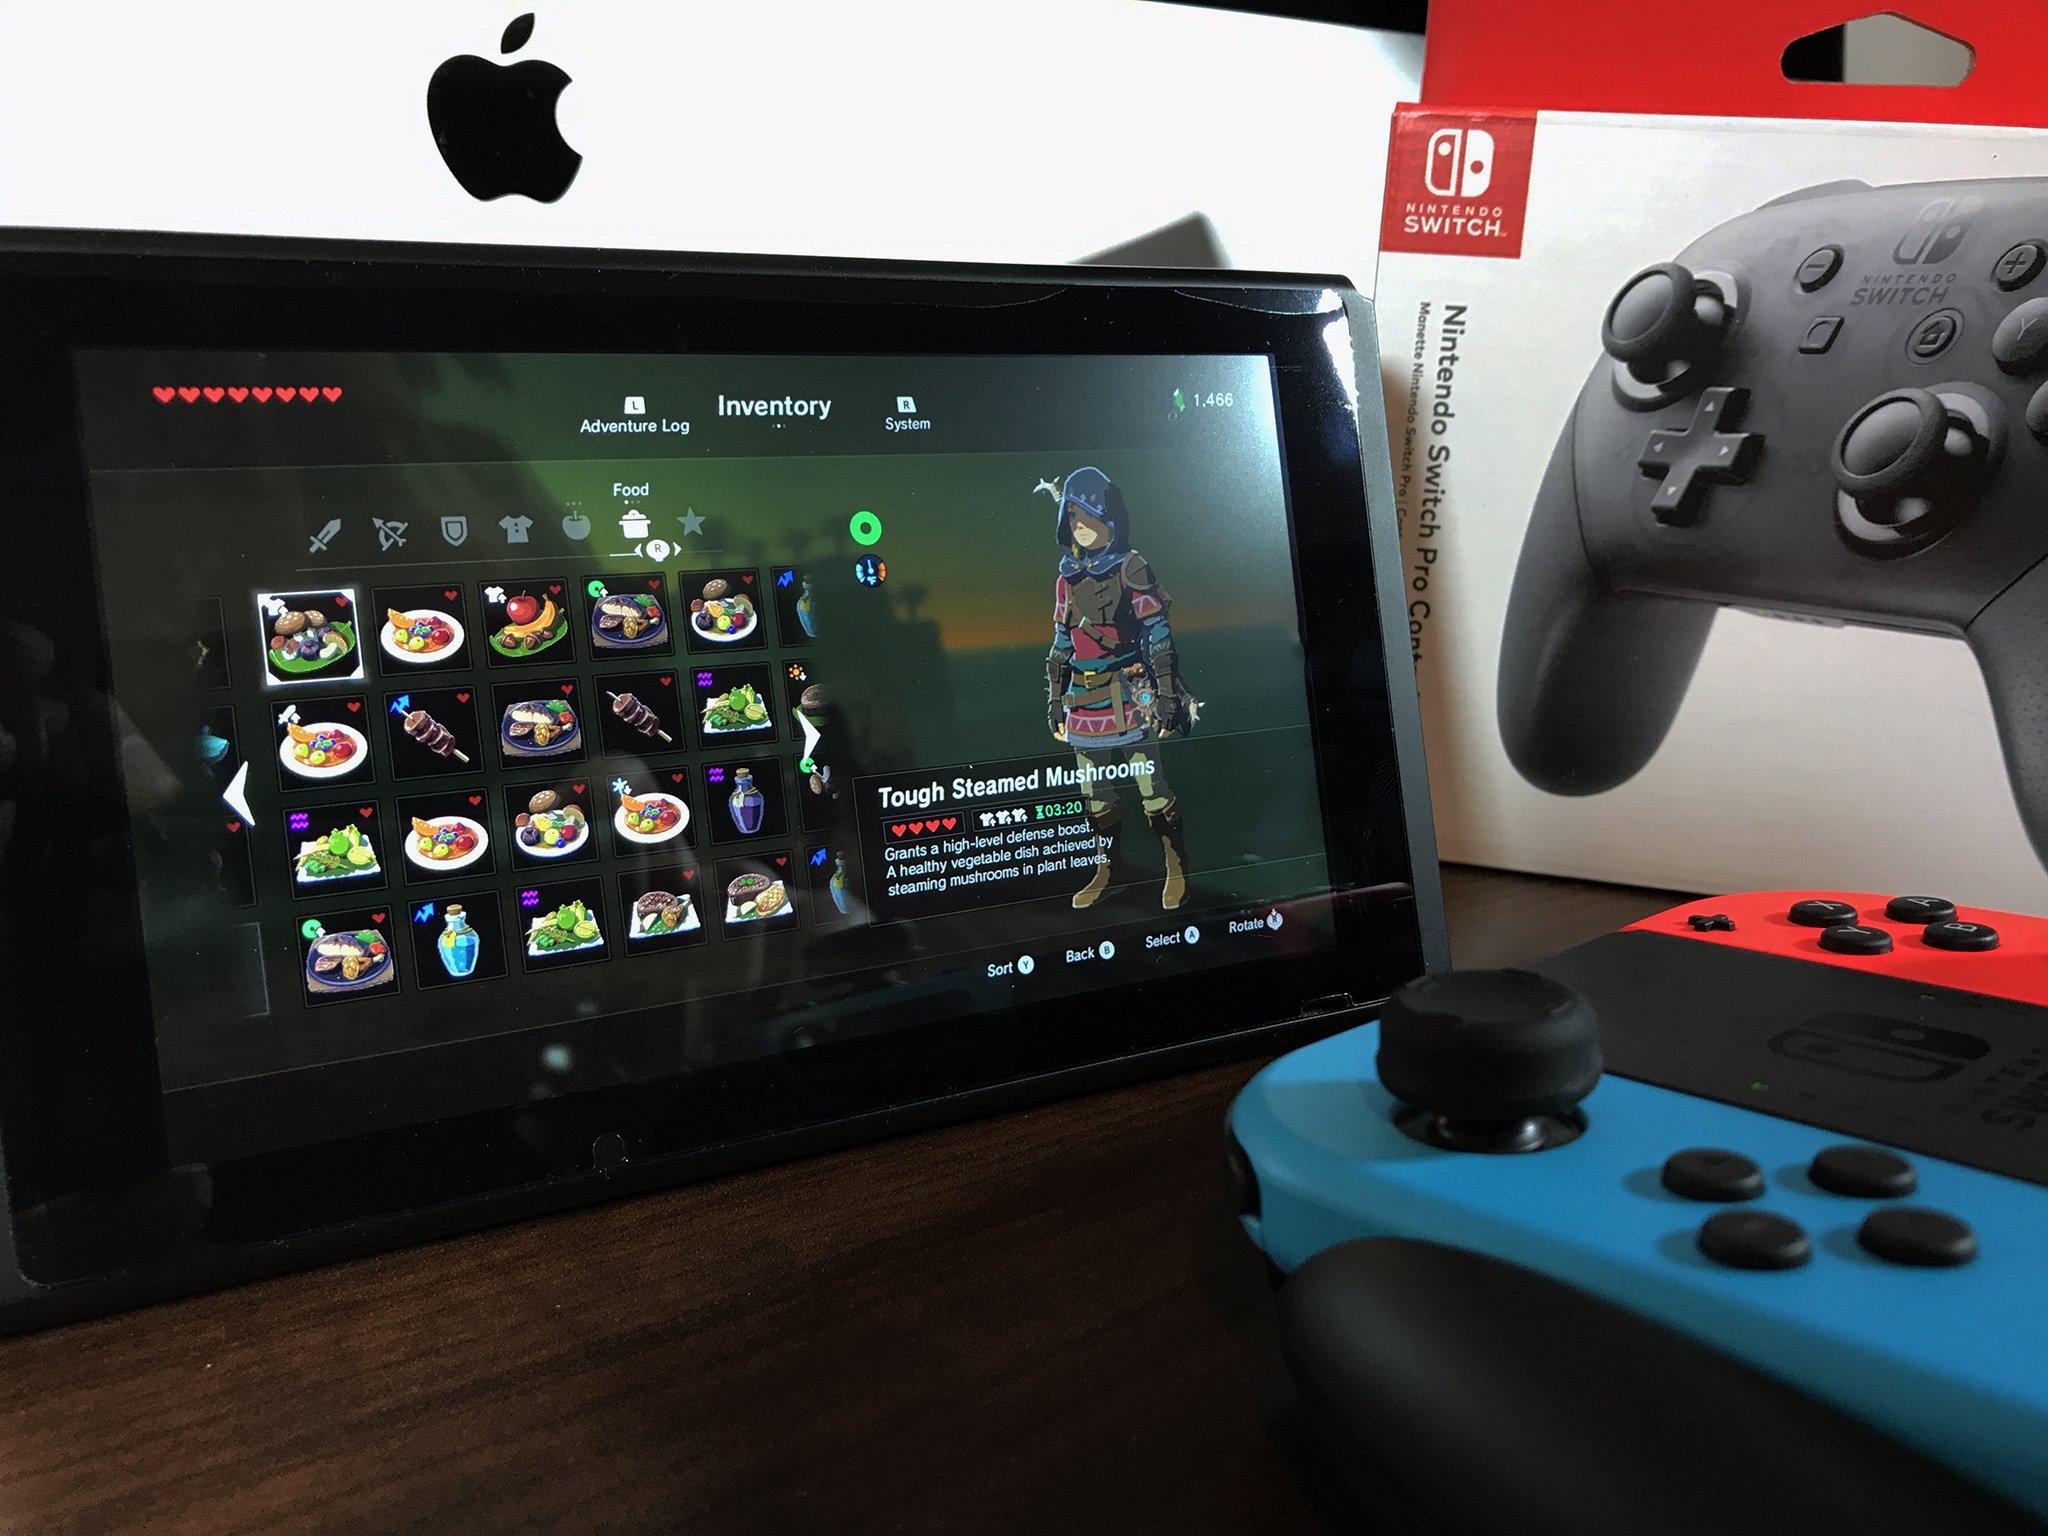 Zelda Botw Wallpaper Iphone X Should You Buy A Nintendo Switch Imore